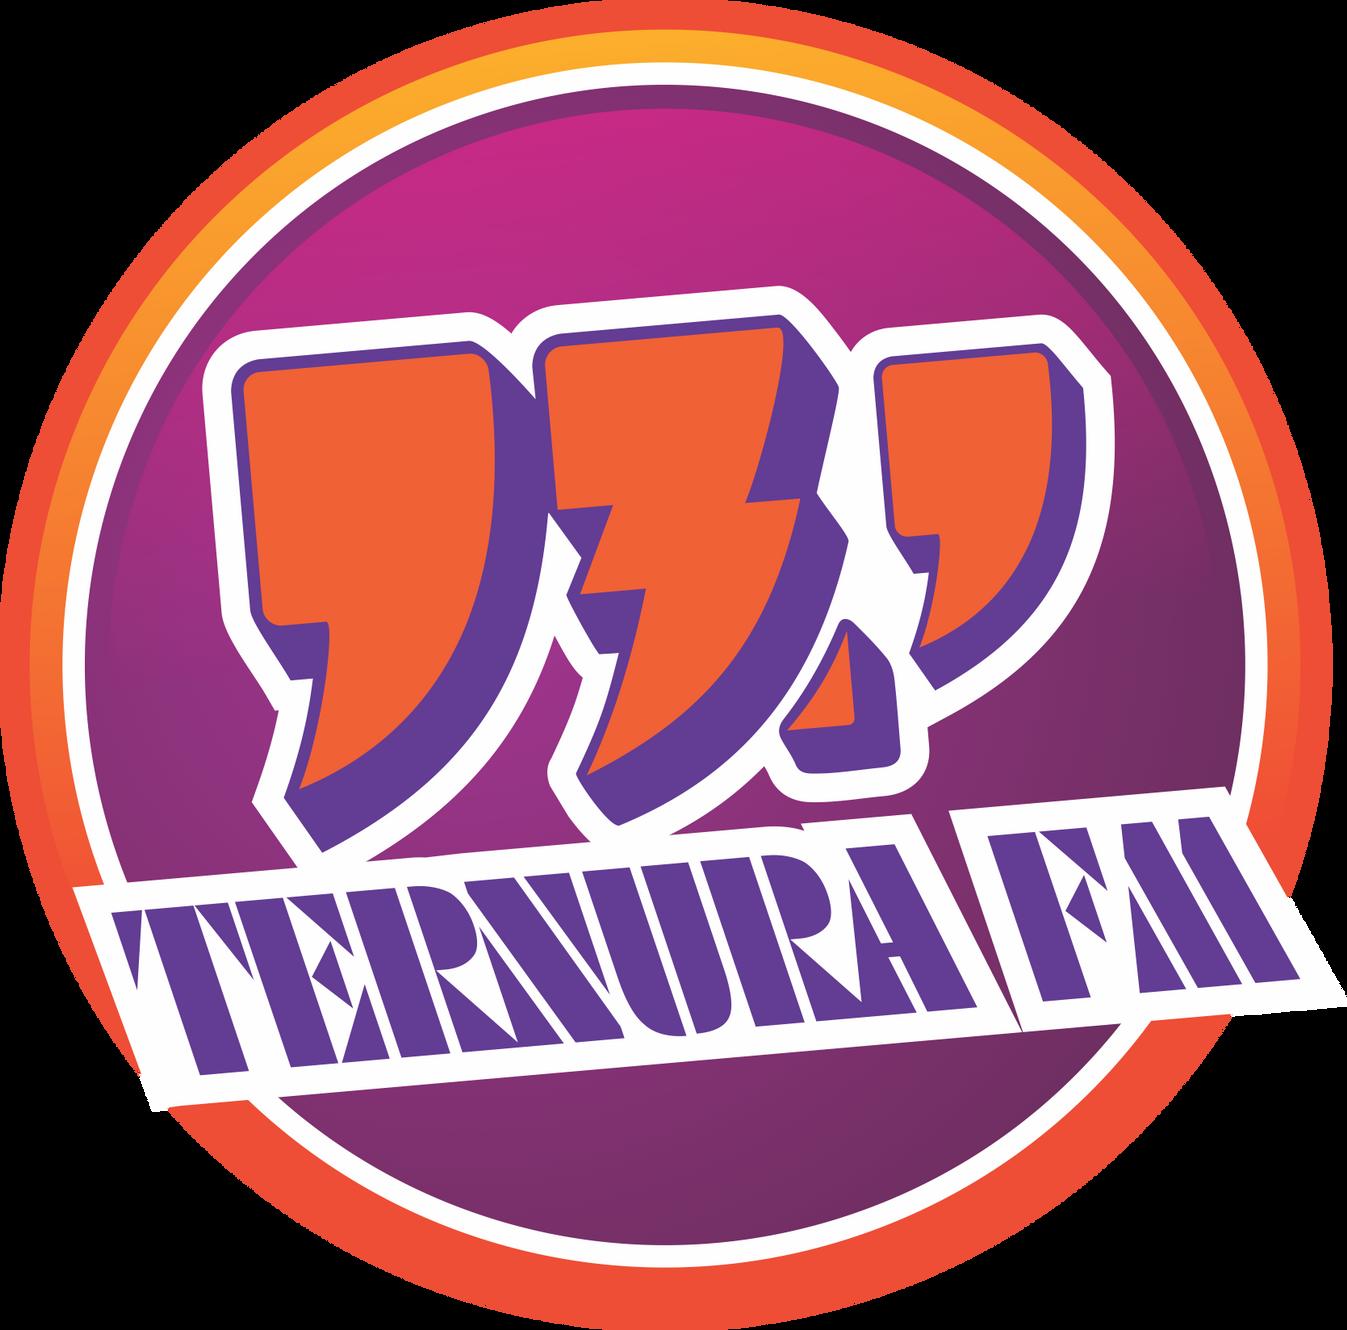 (c) Ternurafm.com.br